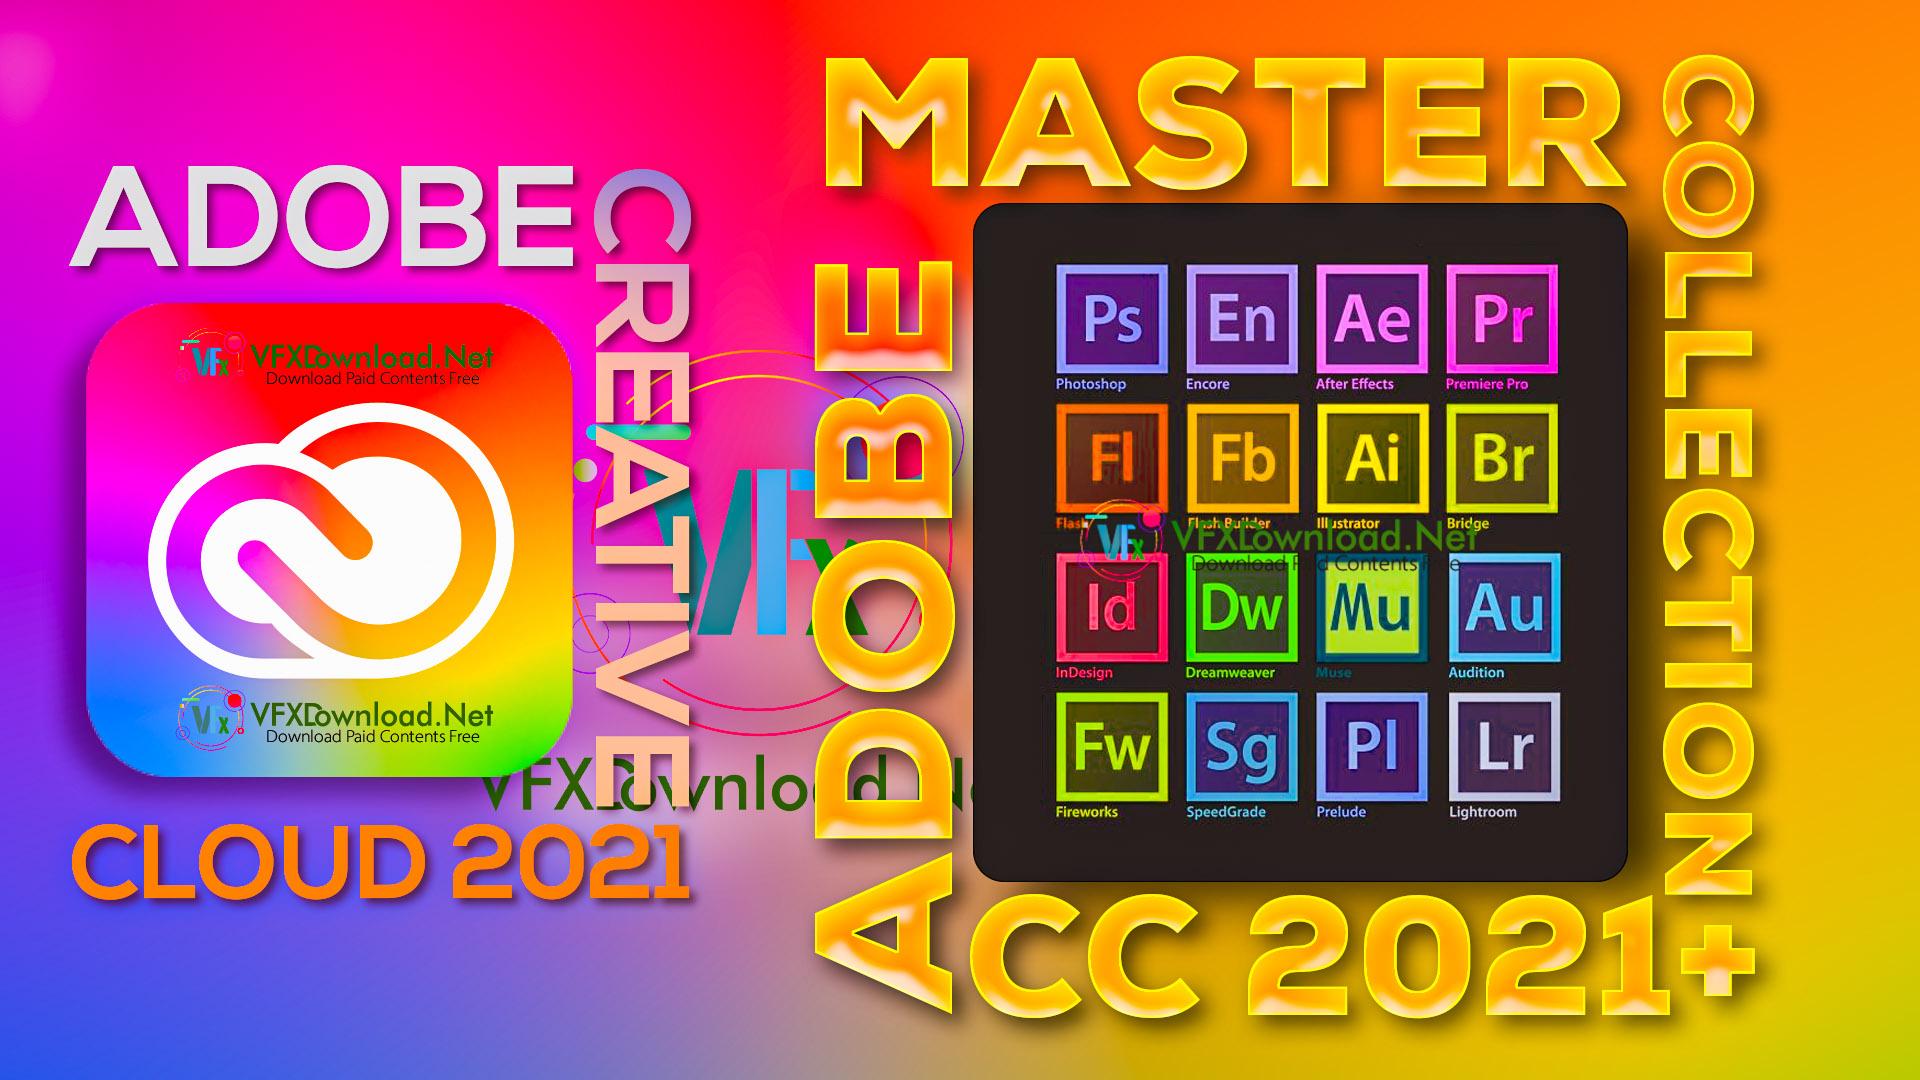 Adobe Master Collection CC 2021 - Adobe Creative Cloud 2021